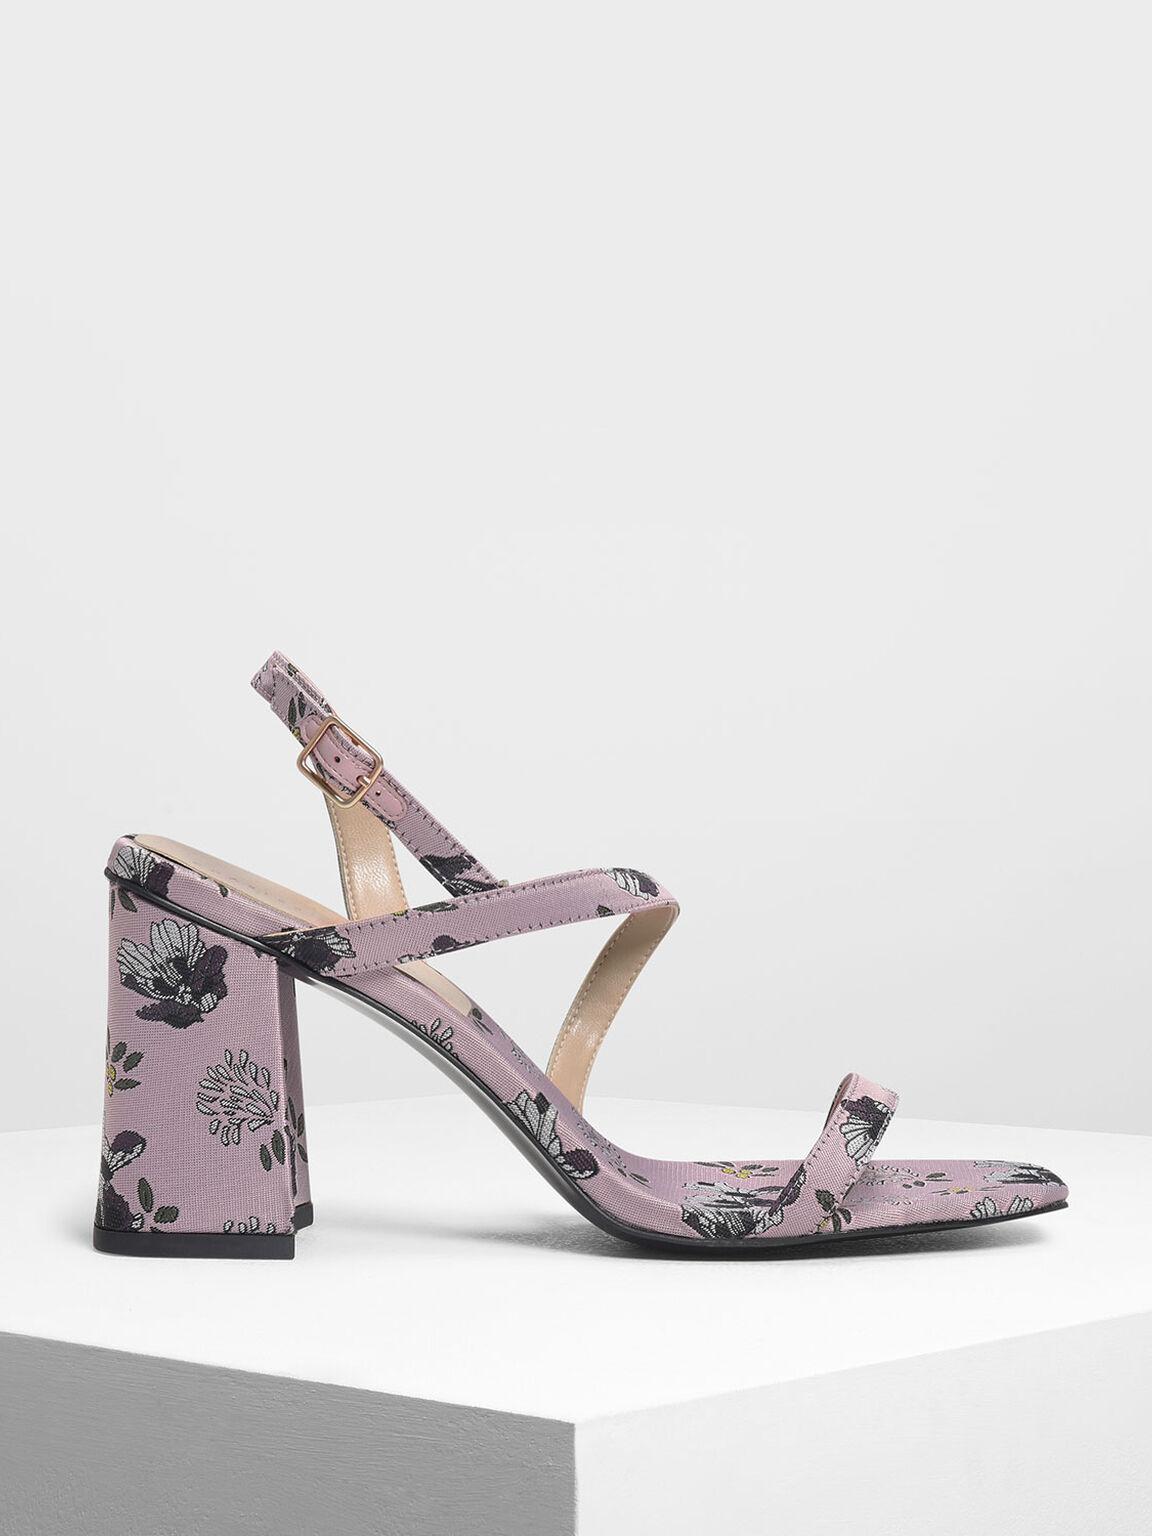 Asymmetrical Strap Heeled Sandals, Lilac, hi-res